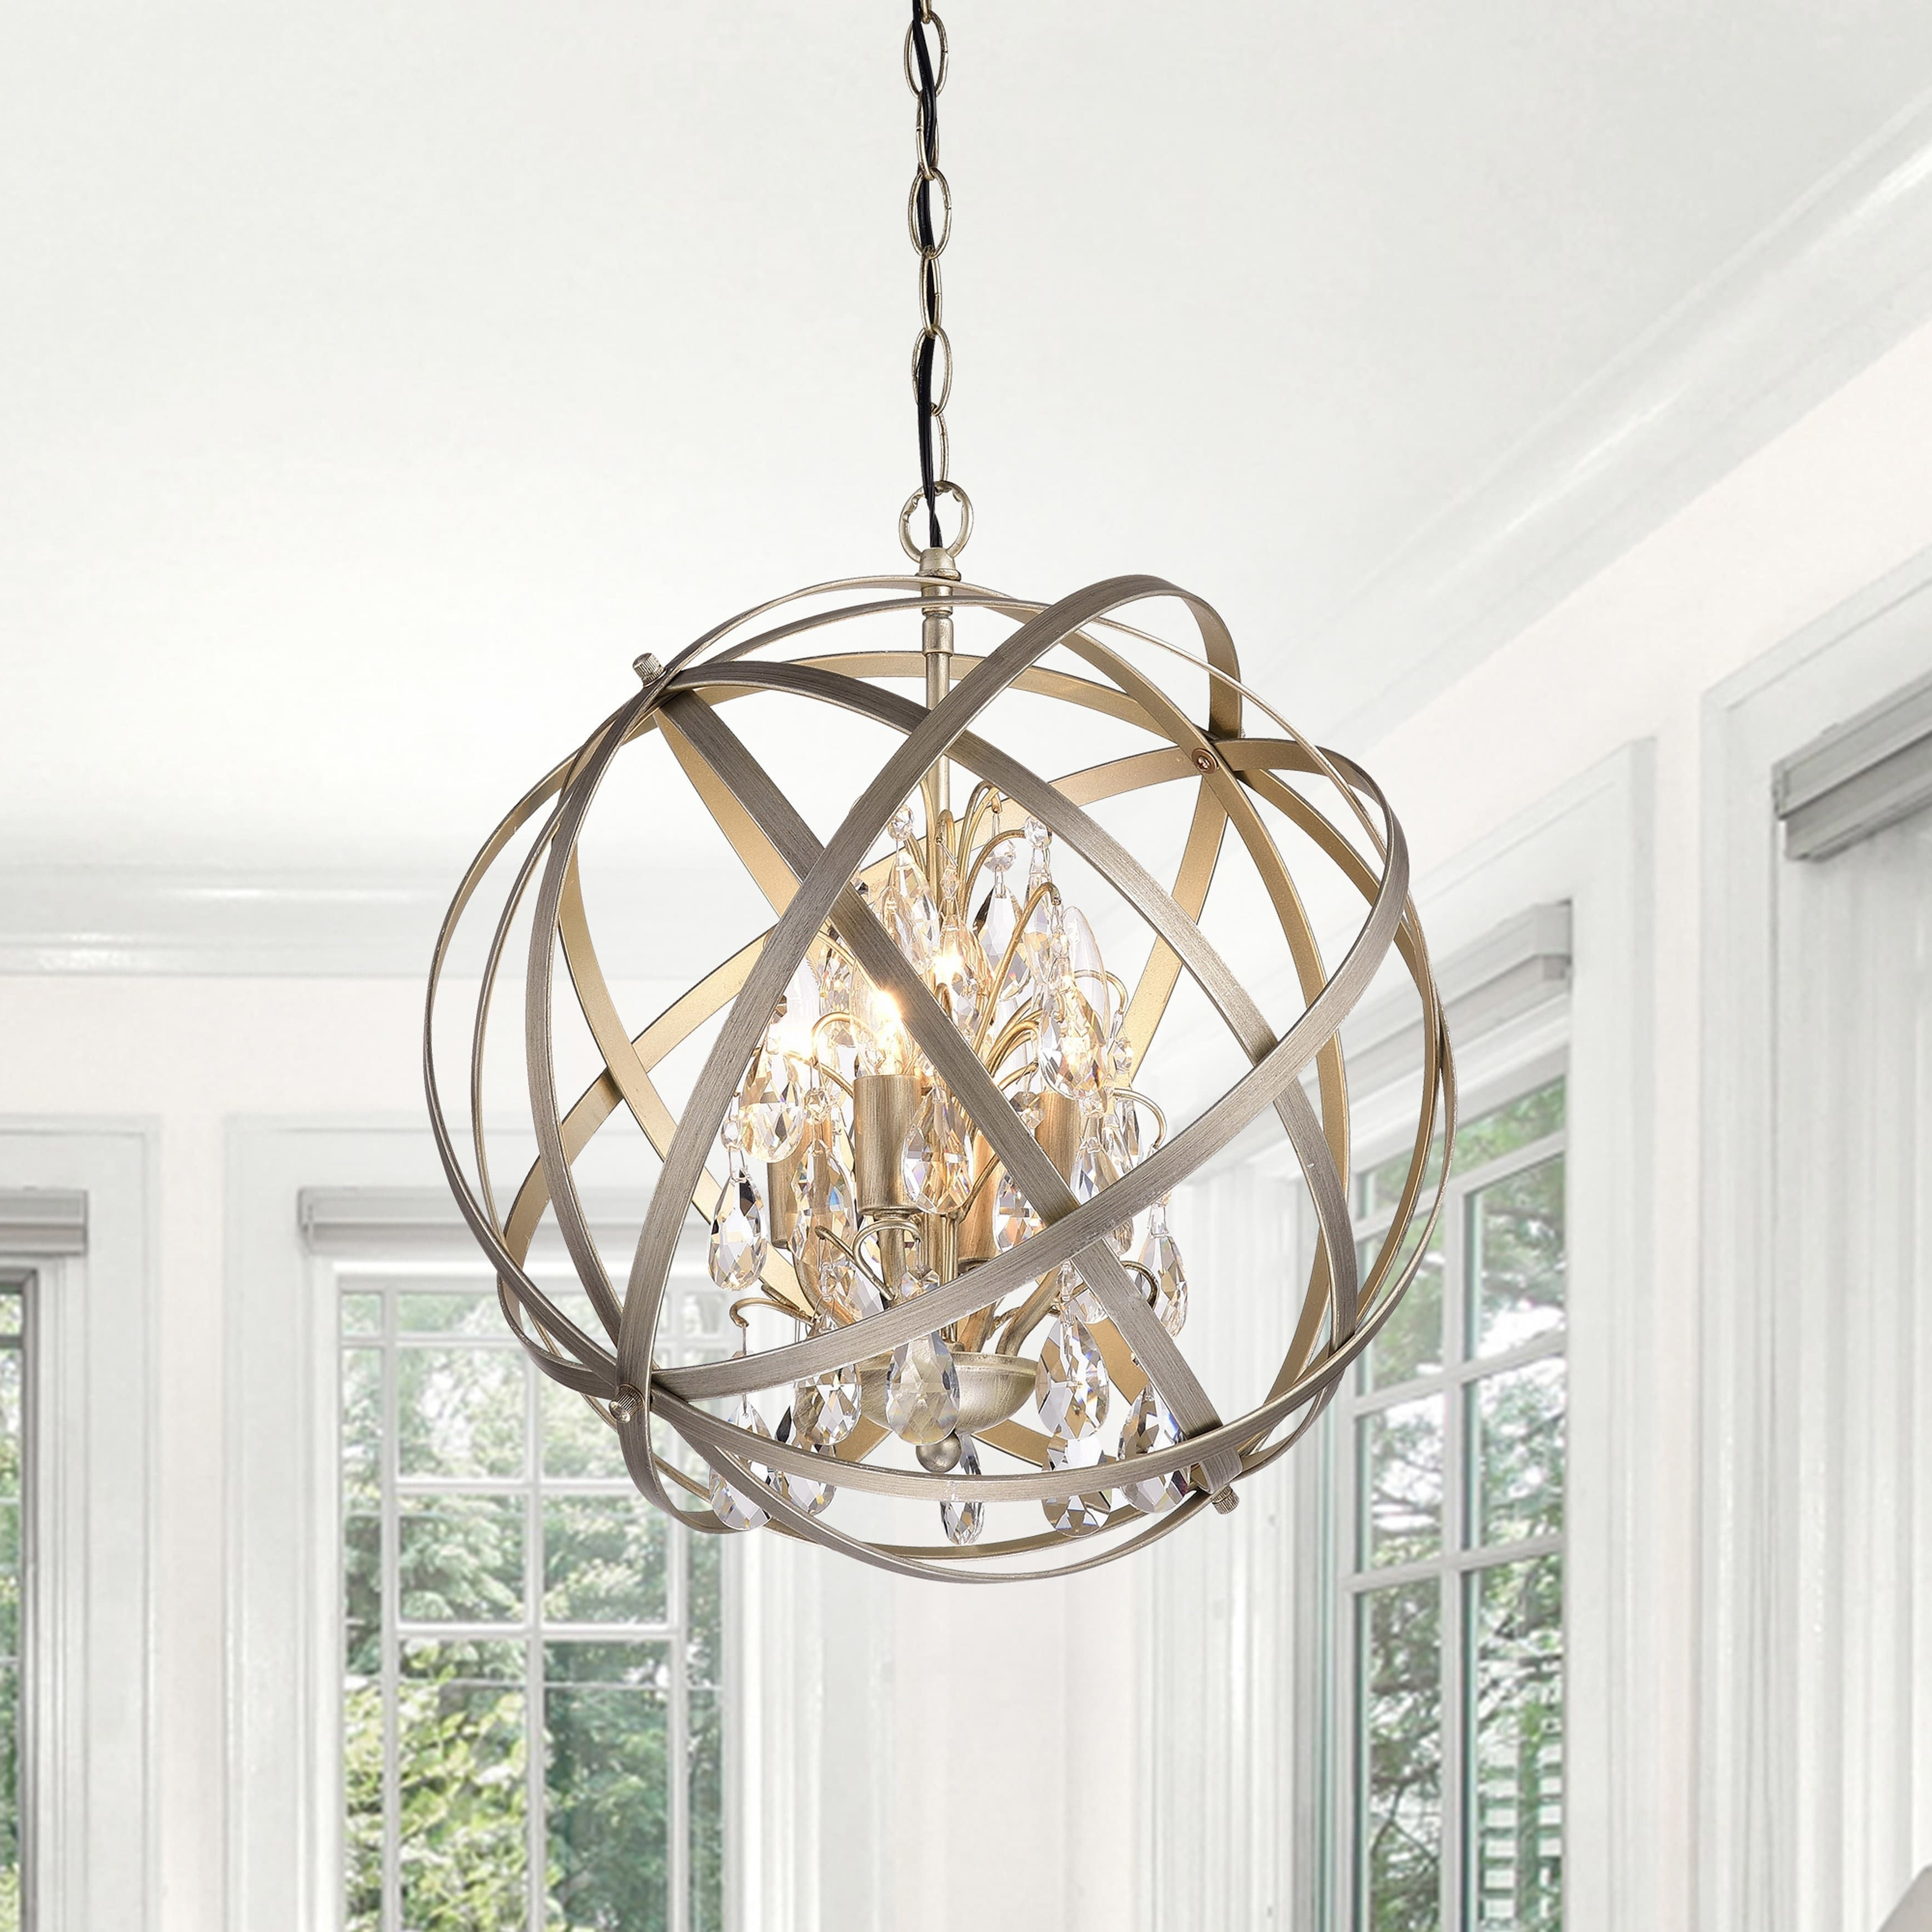 Benita Antique Copper 3 Light Metal Globe Crystal Chandelier For Preferred Globe Crystal Chandelier (View 20 of 20)